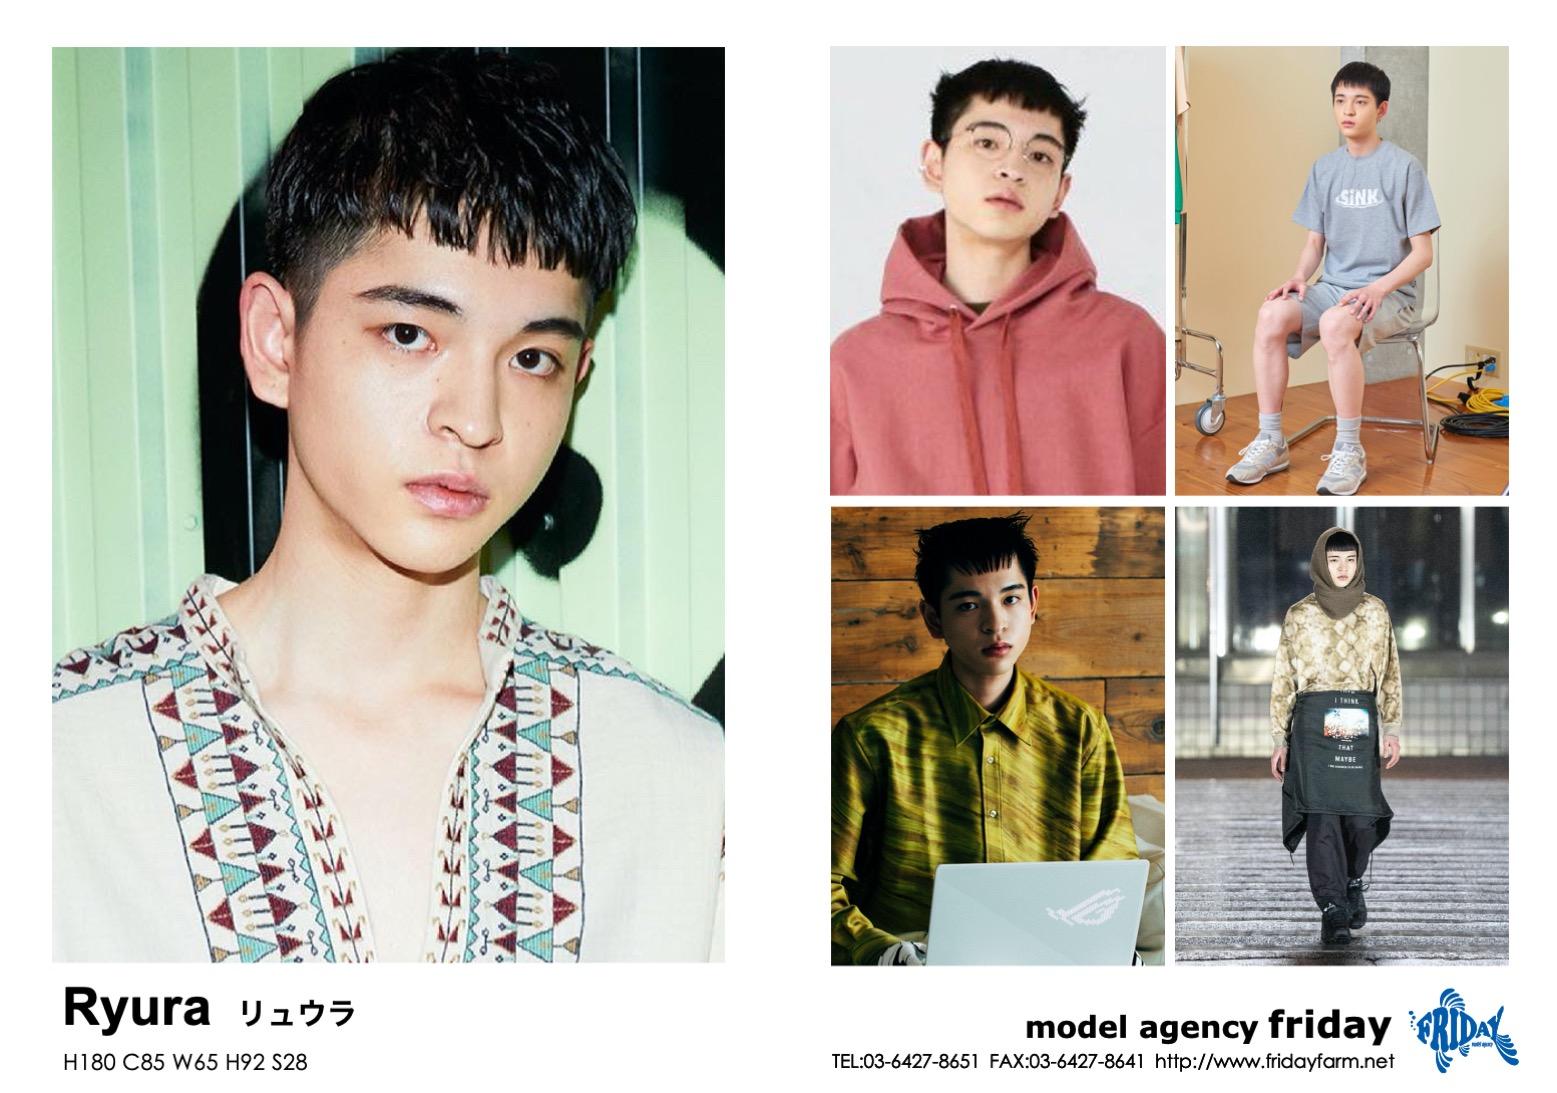 RYURA - リュウラ | model agency friday